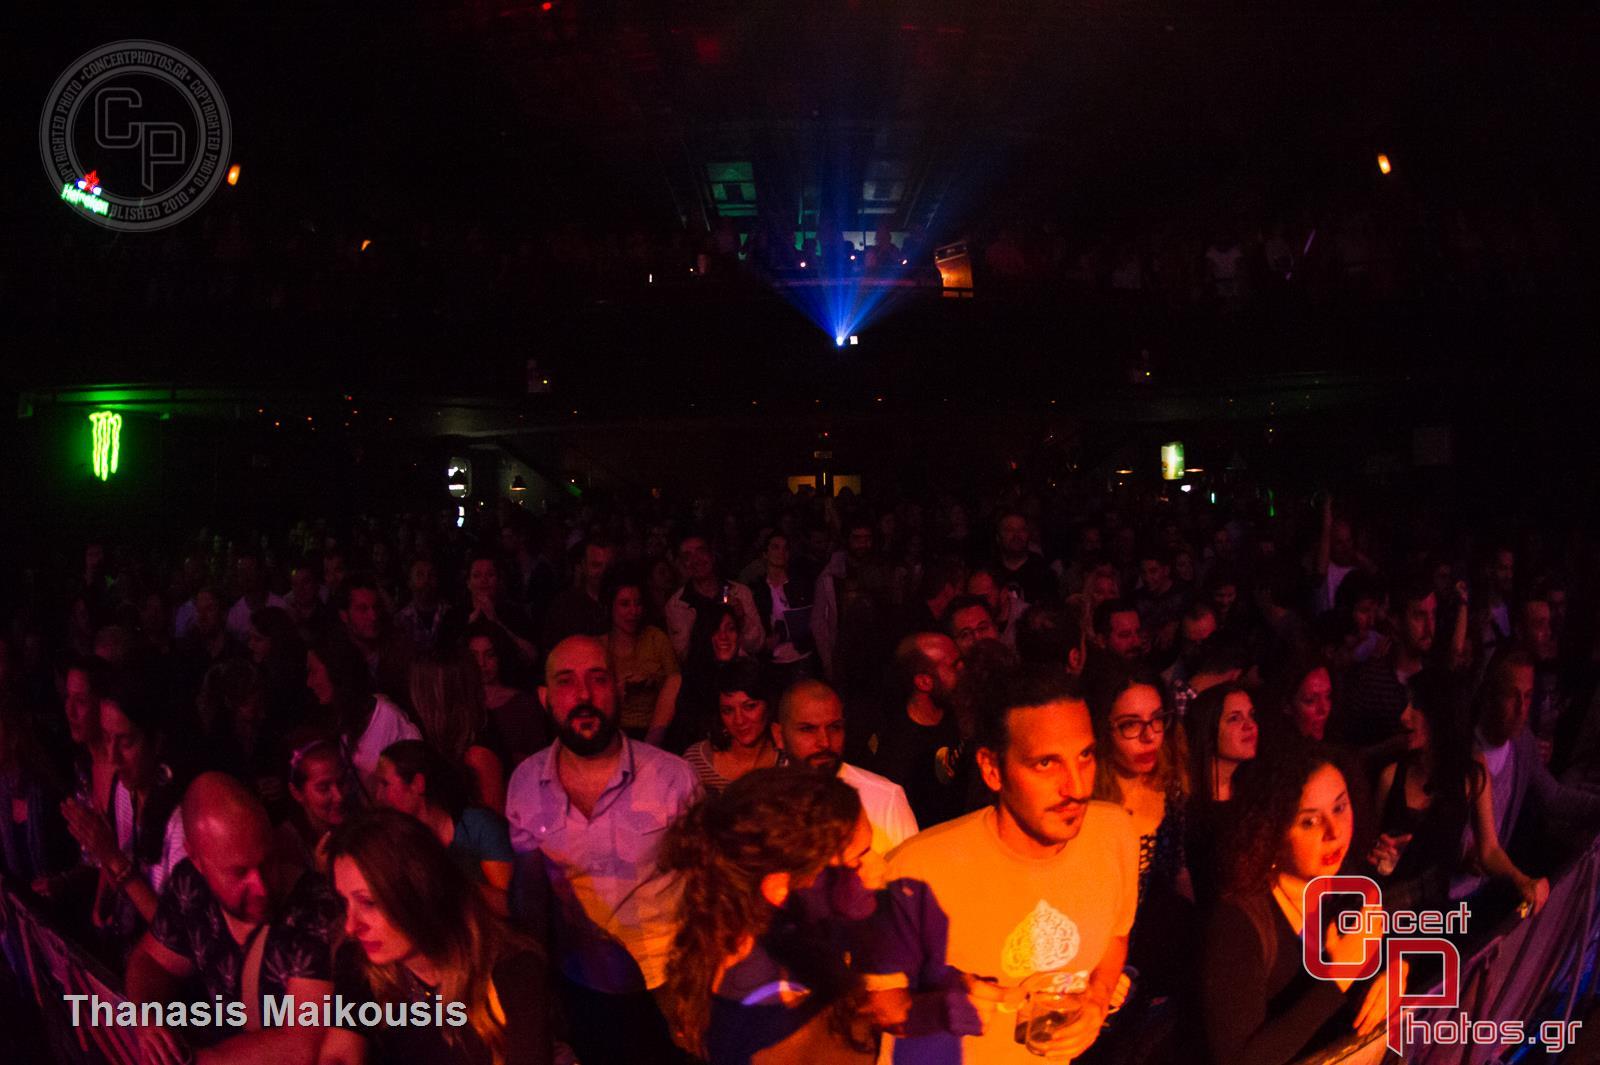 Quantic & Kill Emil -Quantic Kill Emil Gagarin photographer: Thanasis Maikousis - ConcertPhotos - 20141023_2300_20